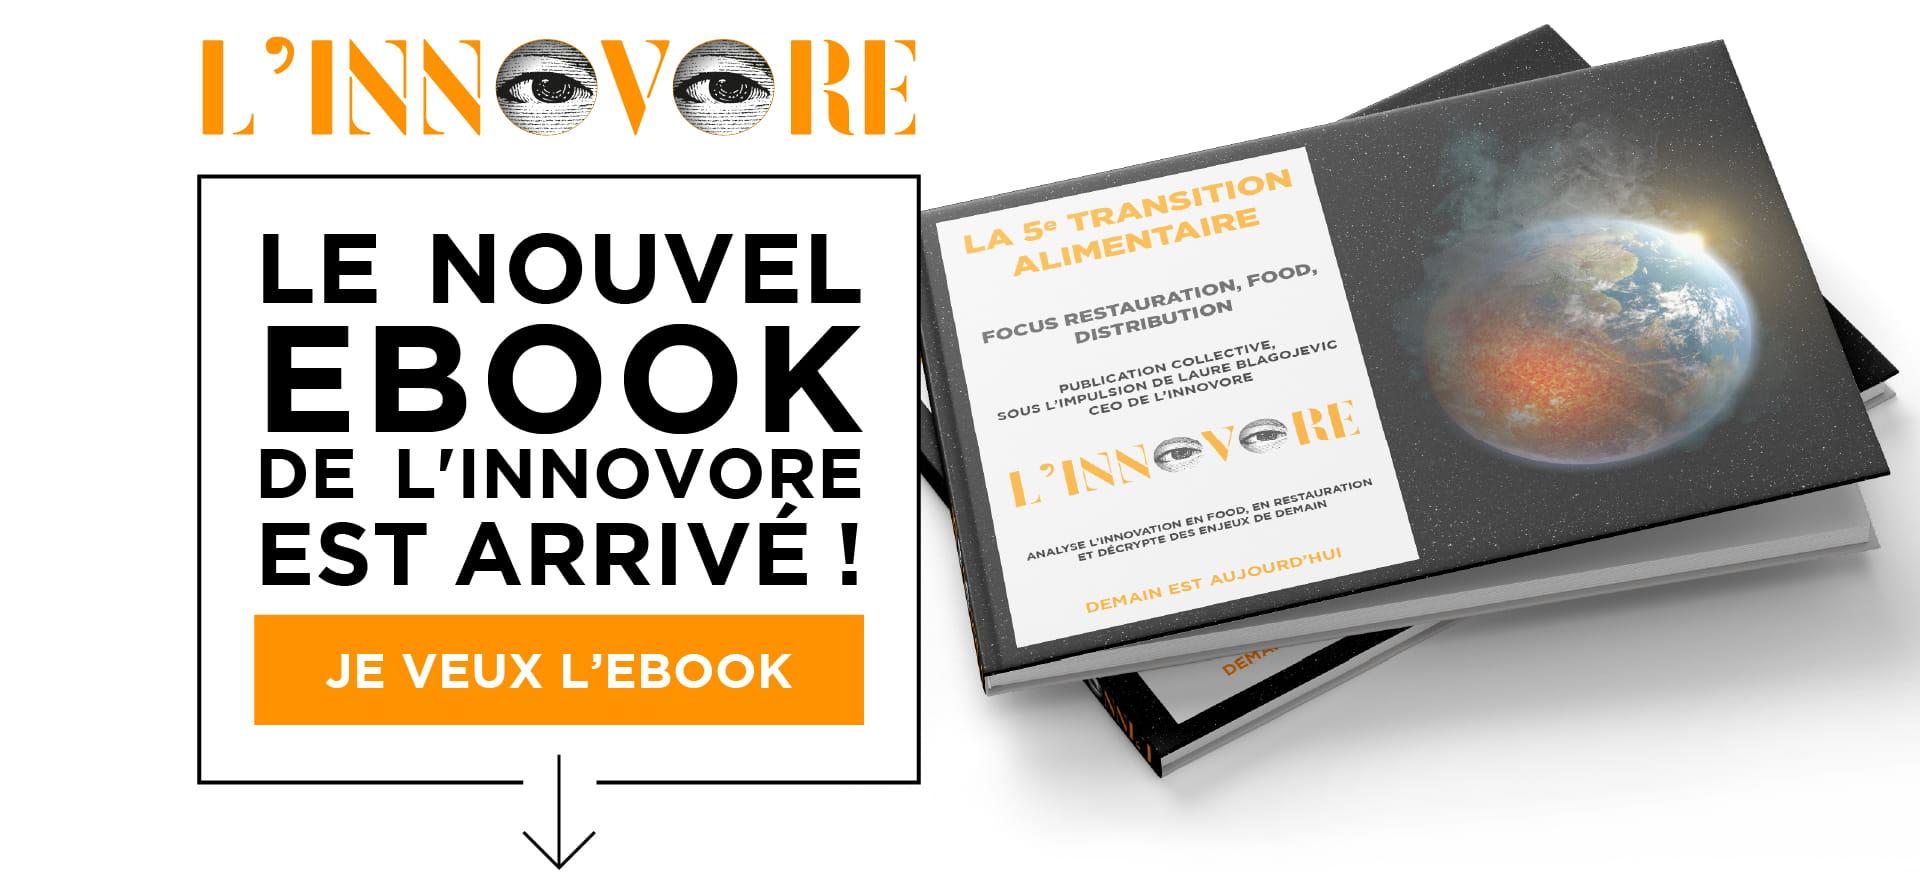 L-INNOVORE-LA-5IEME-TRANSITION-ALIMENTAIRE